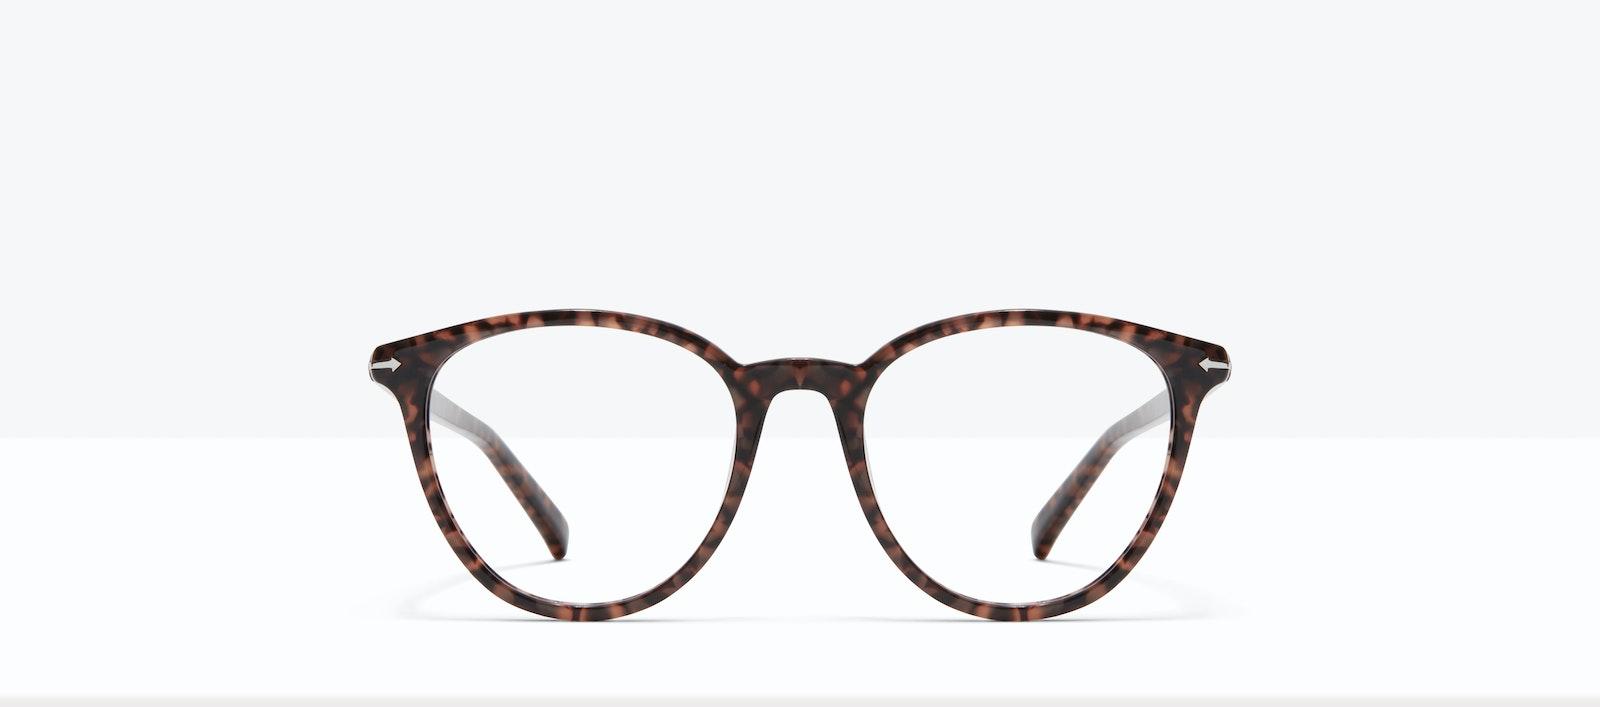 Affordable Fashion Glasses Round Eyeglasses Women London Leo Front